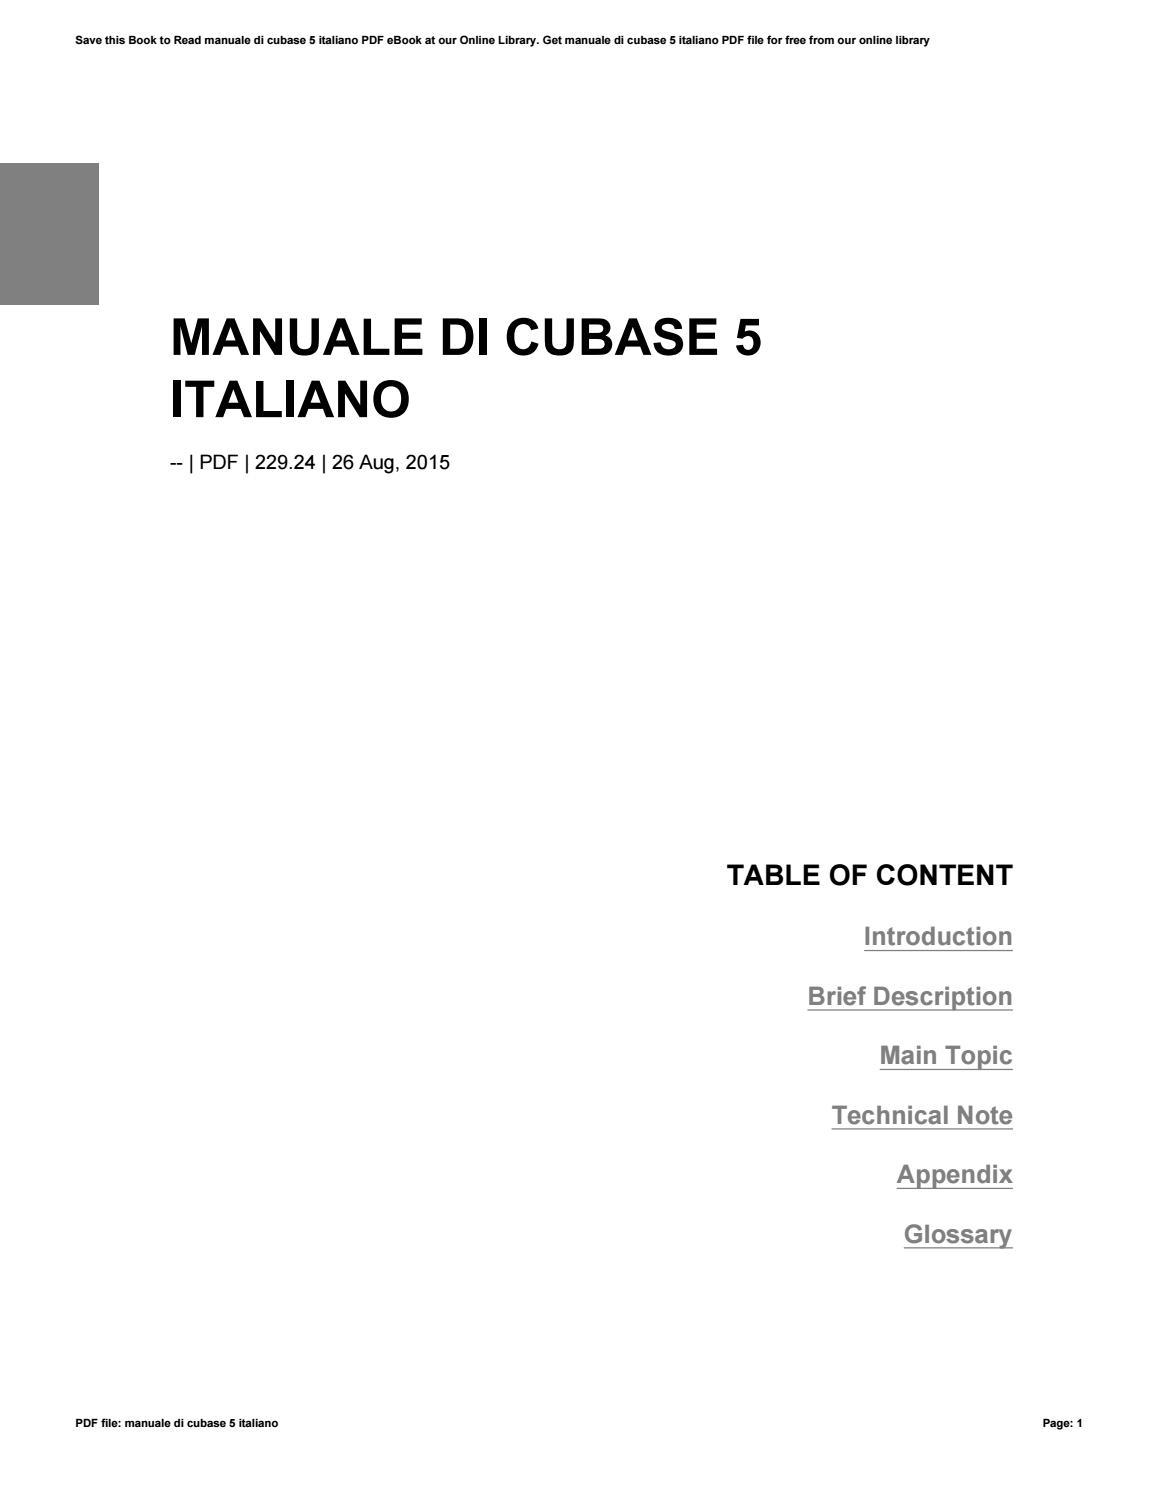 FREE EBOOKS ITALIANO EBOOK